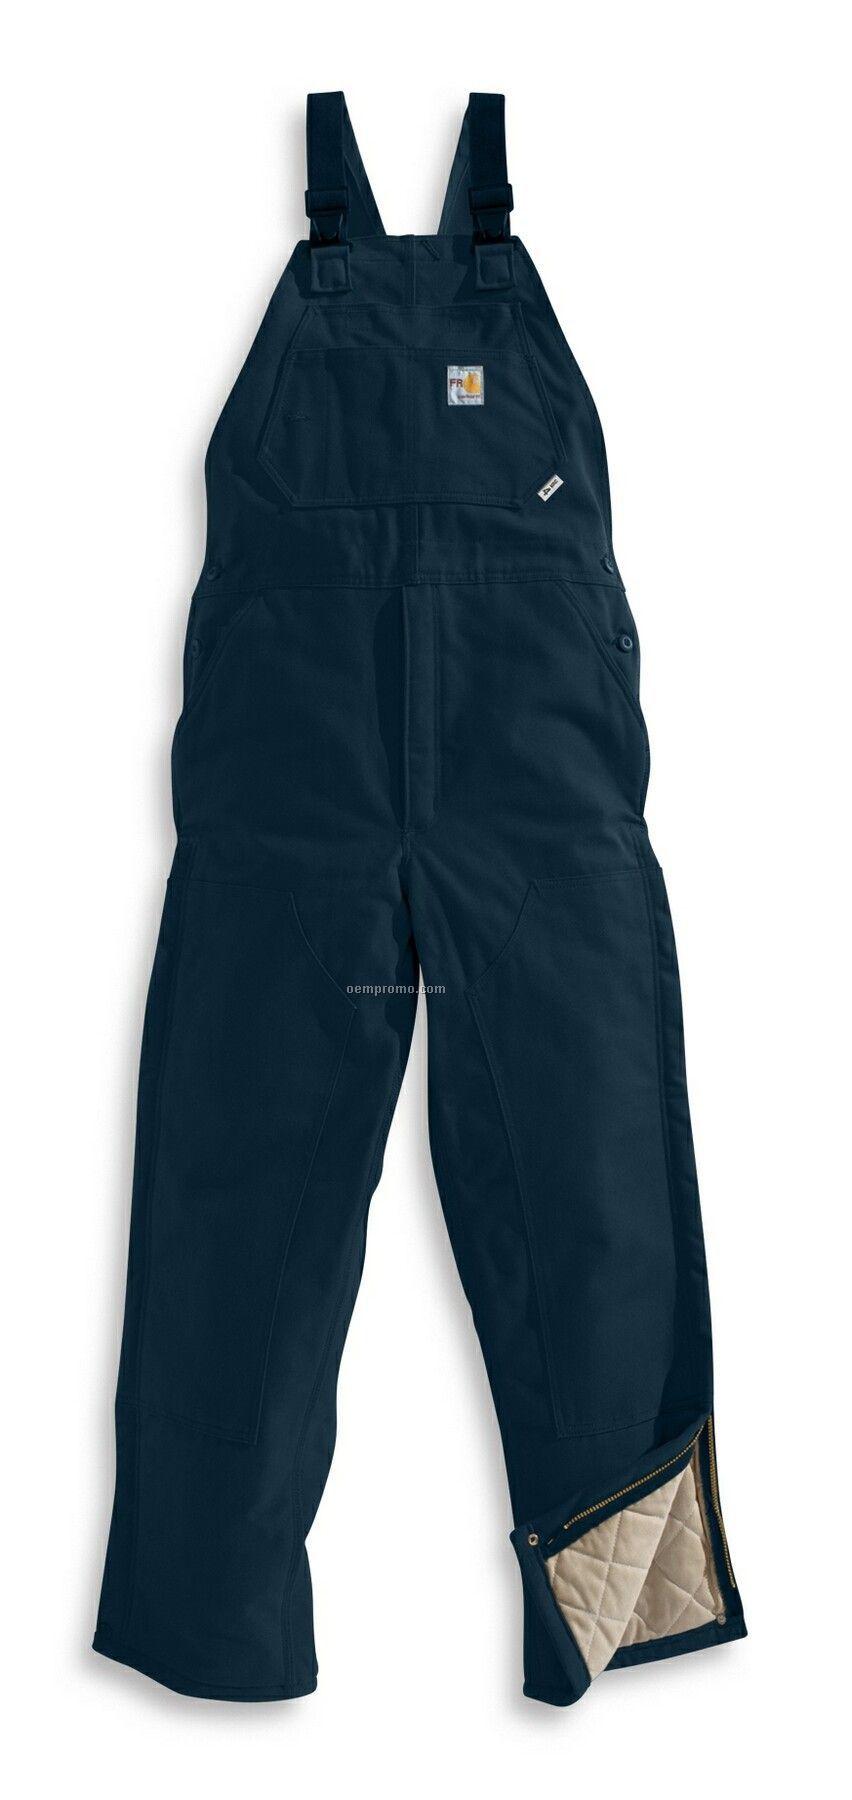 Carhartt Men's Flame Resistant Duck Bib Overall/ Quilt Lined